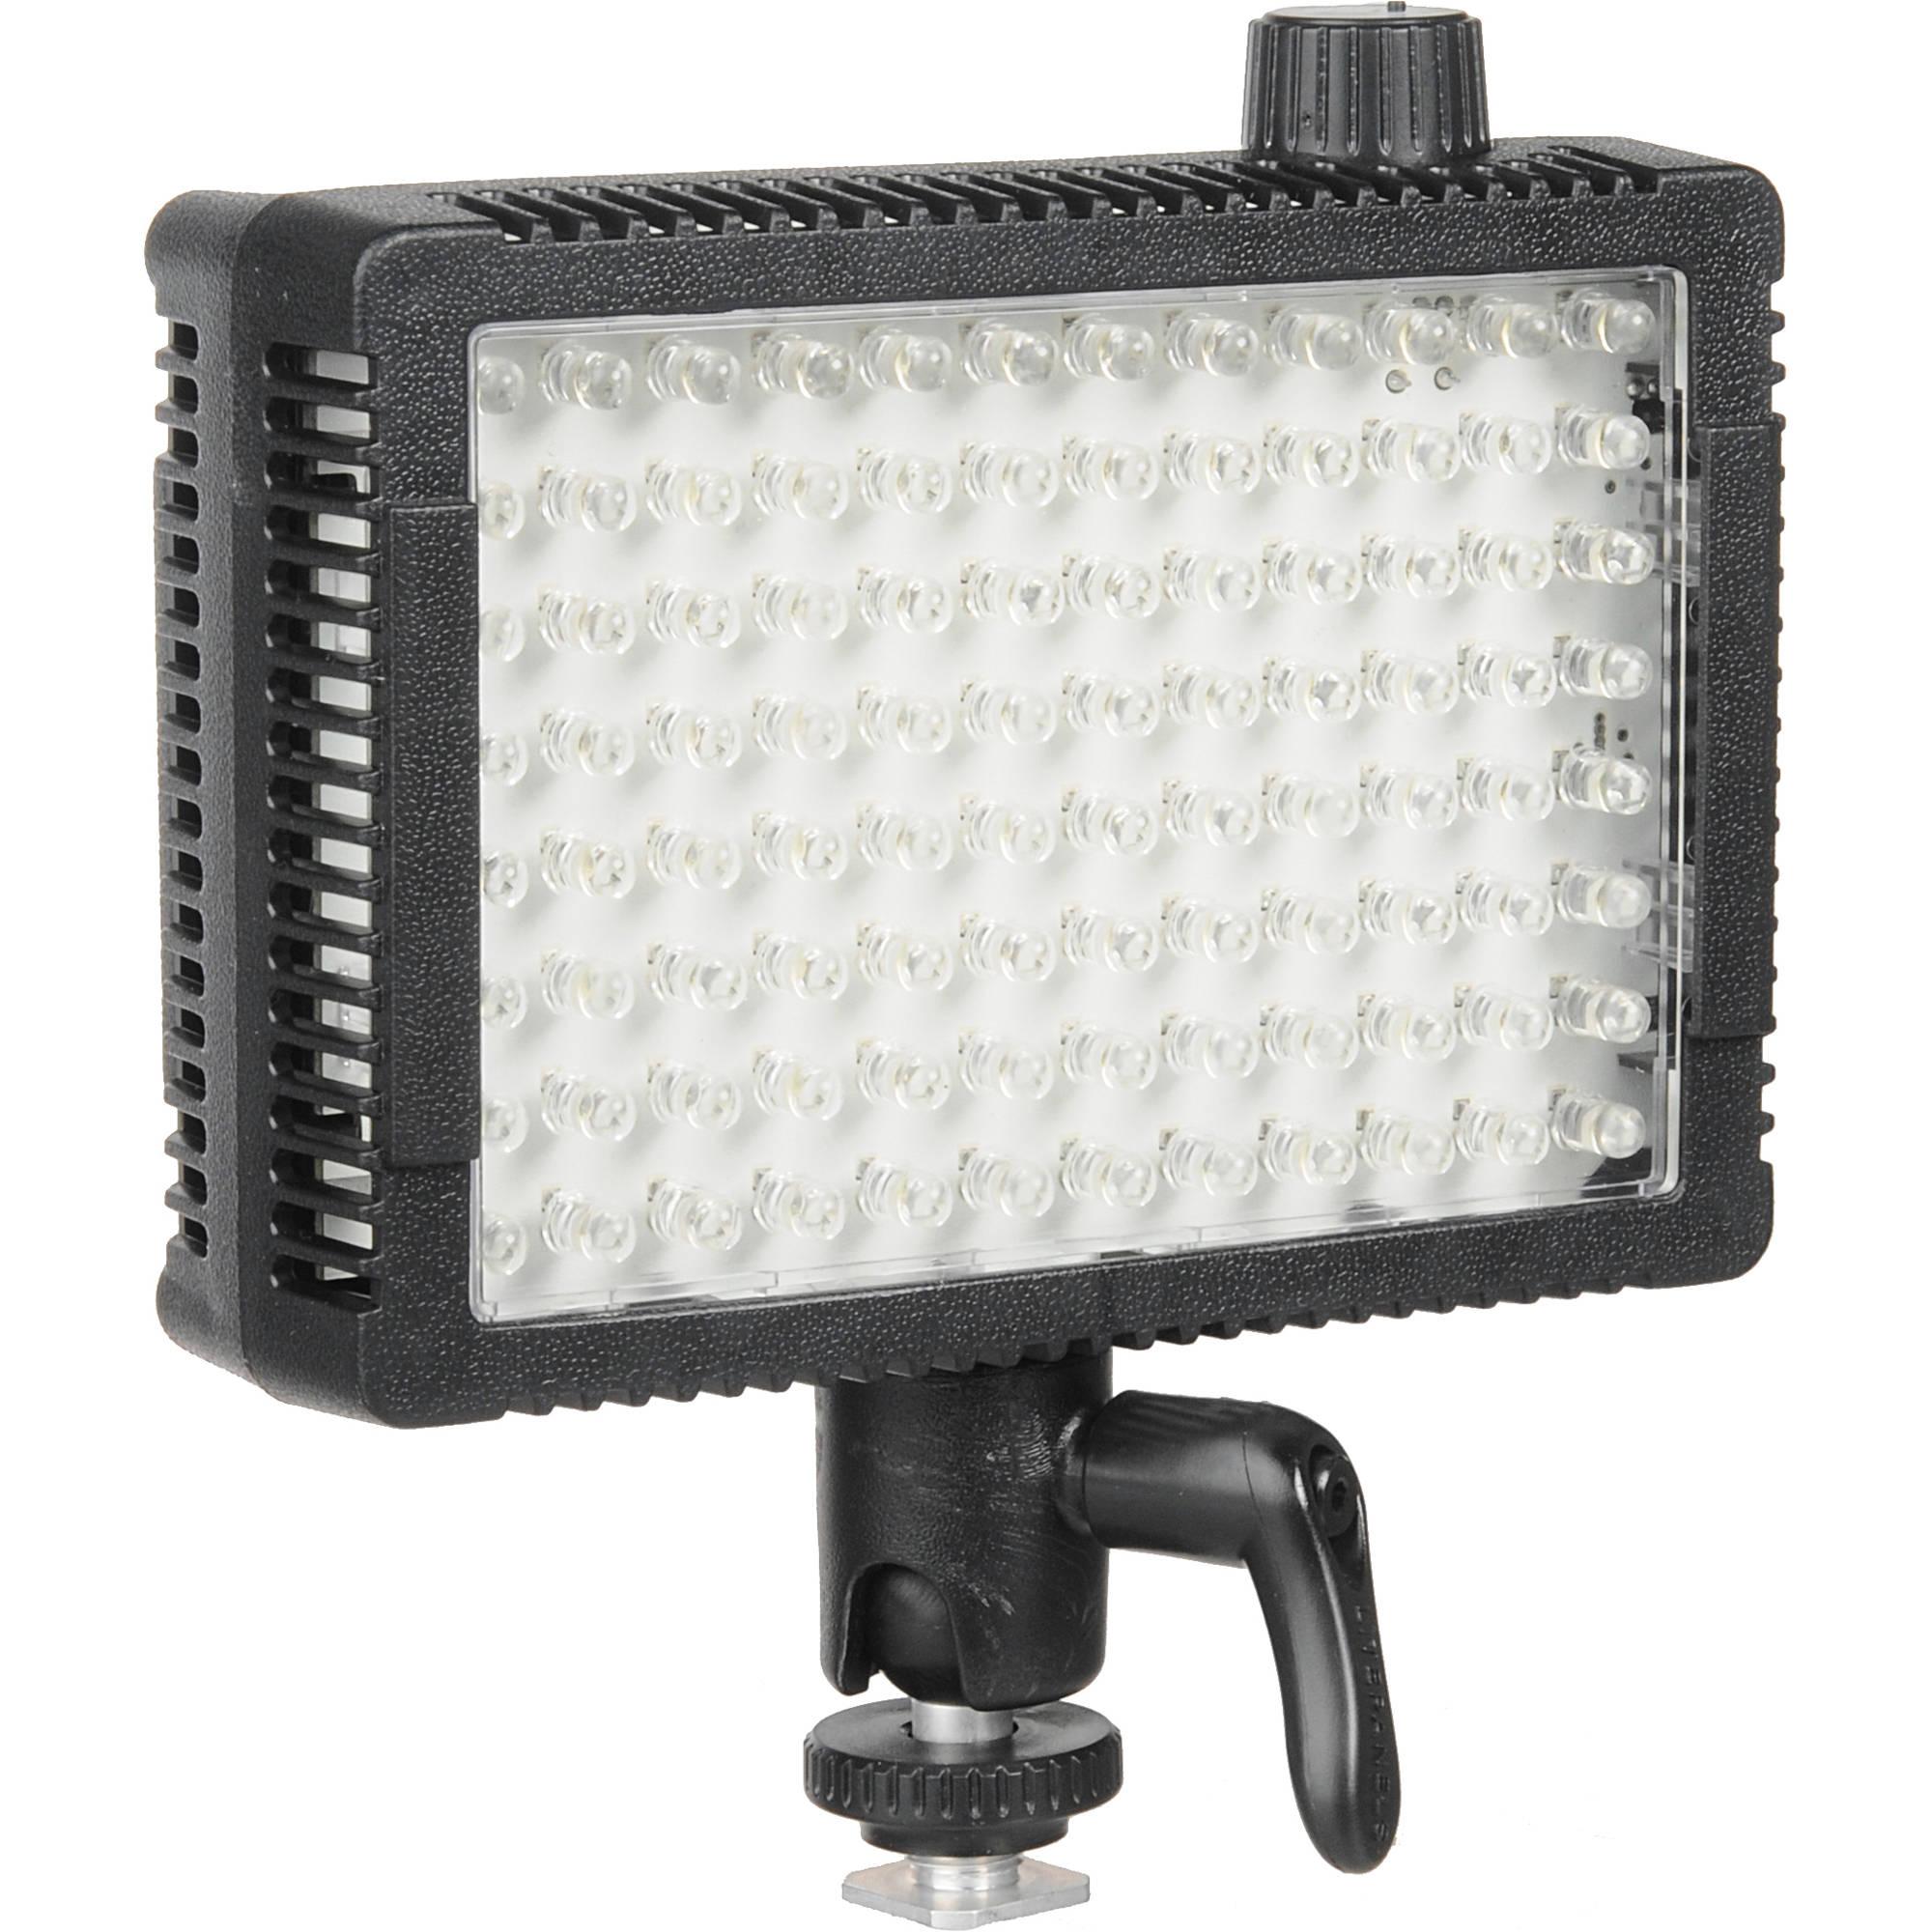 Litepanels MicroPro LED On-Camera Light 905-2002 B&H Photo